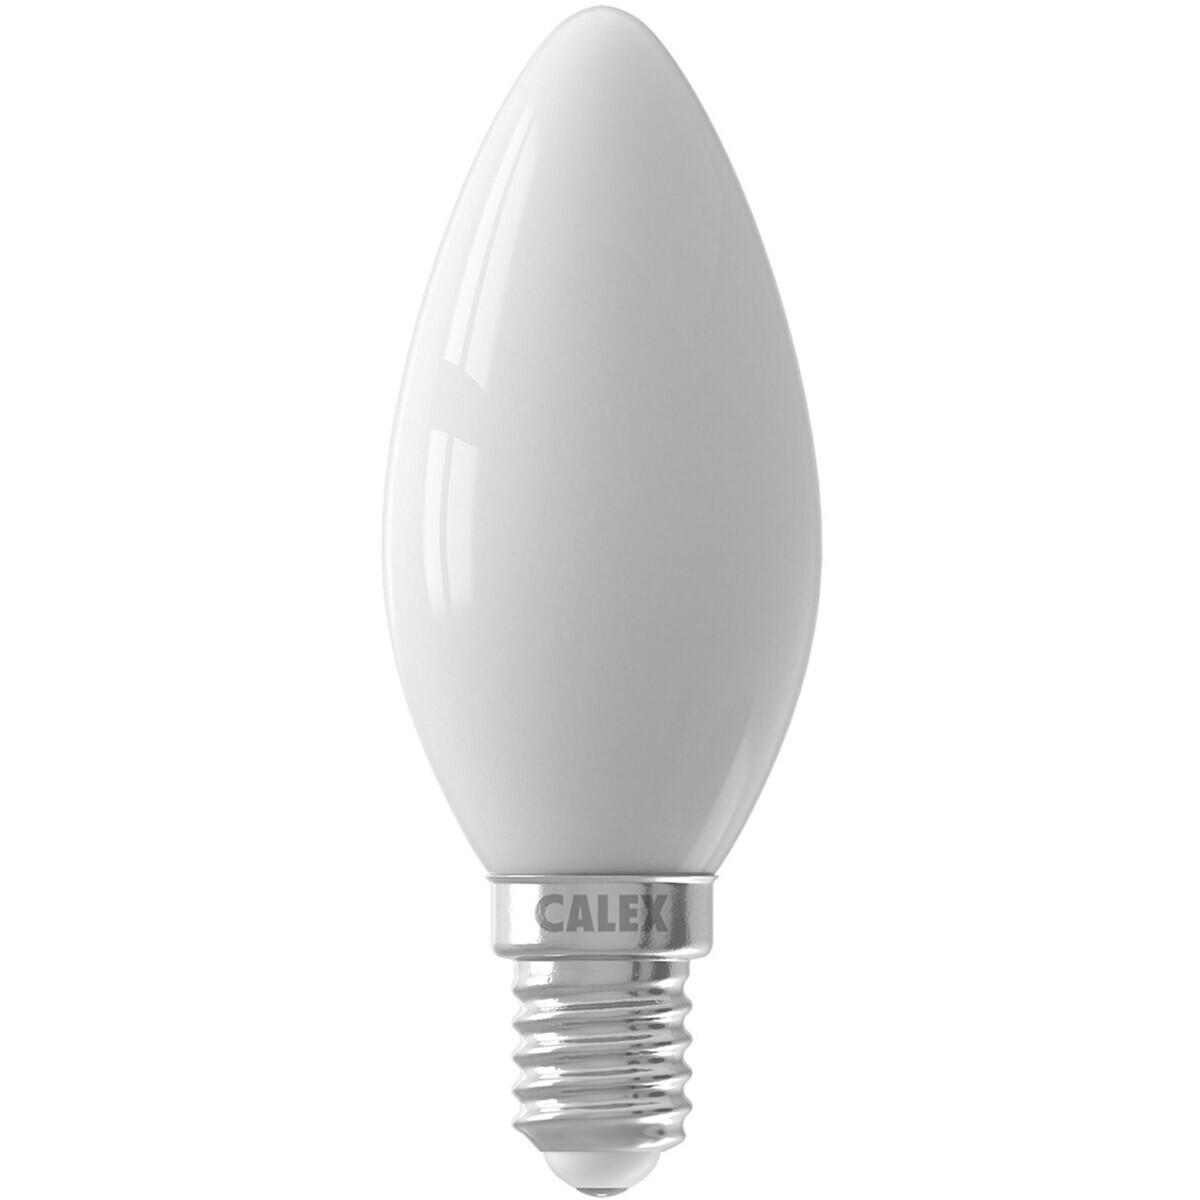 CALEX - LED Lamp - Kaarslamp B35 - E14 Fitting - 3W - Dimbaar - Warm Wit 2700K - Wit